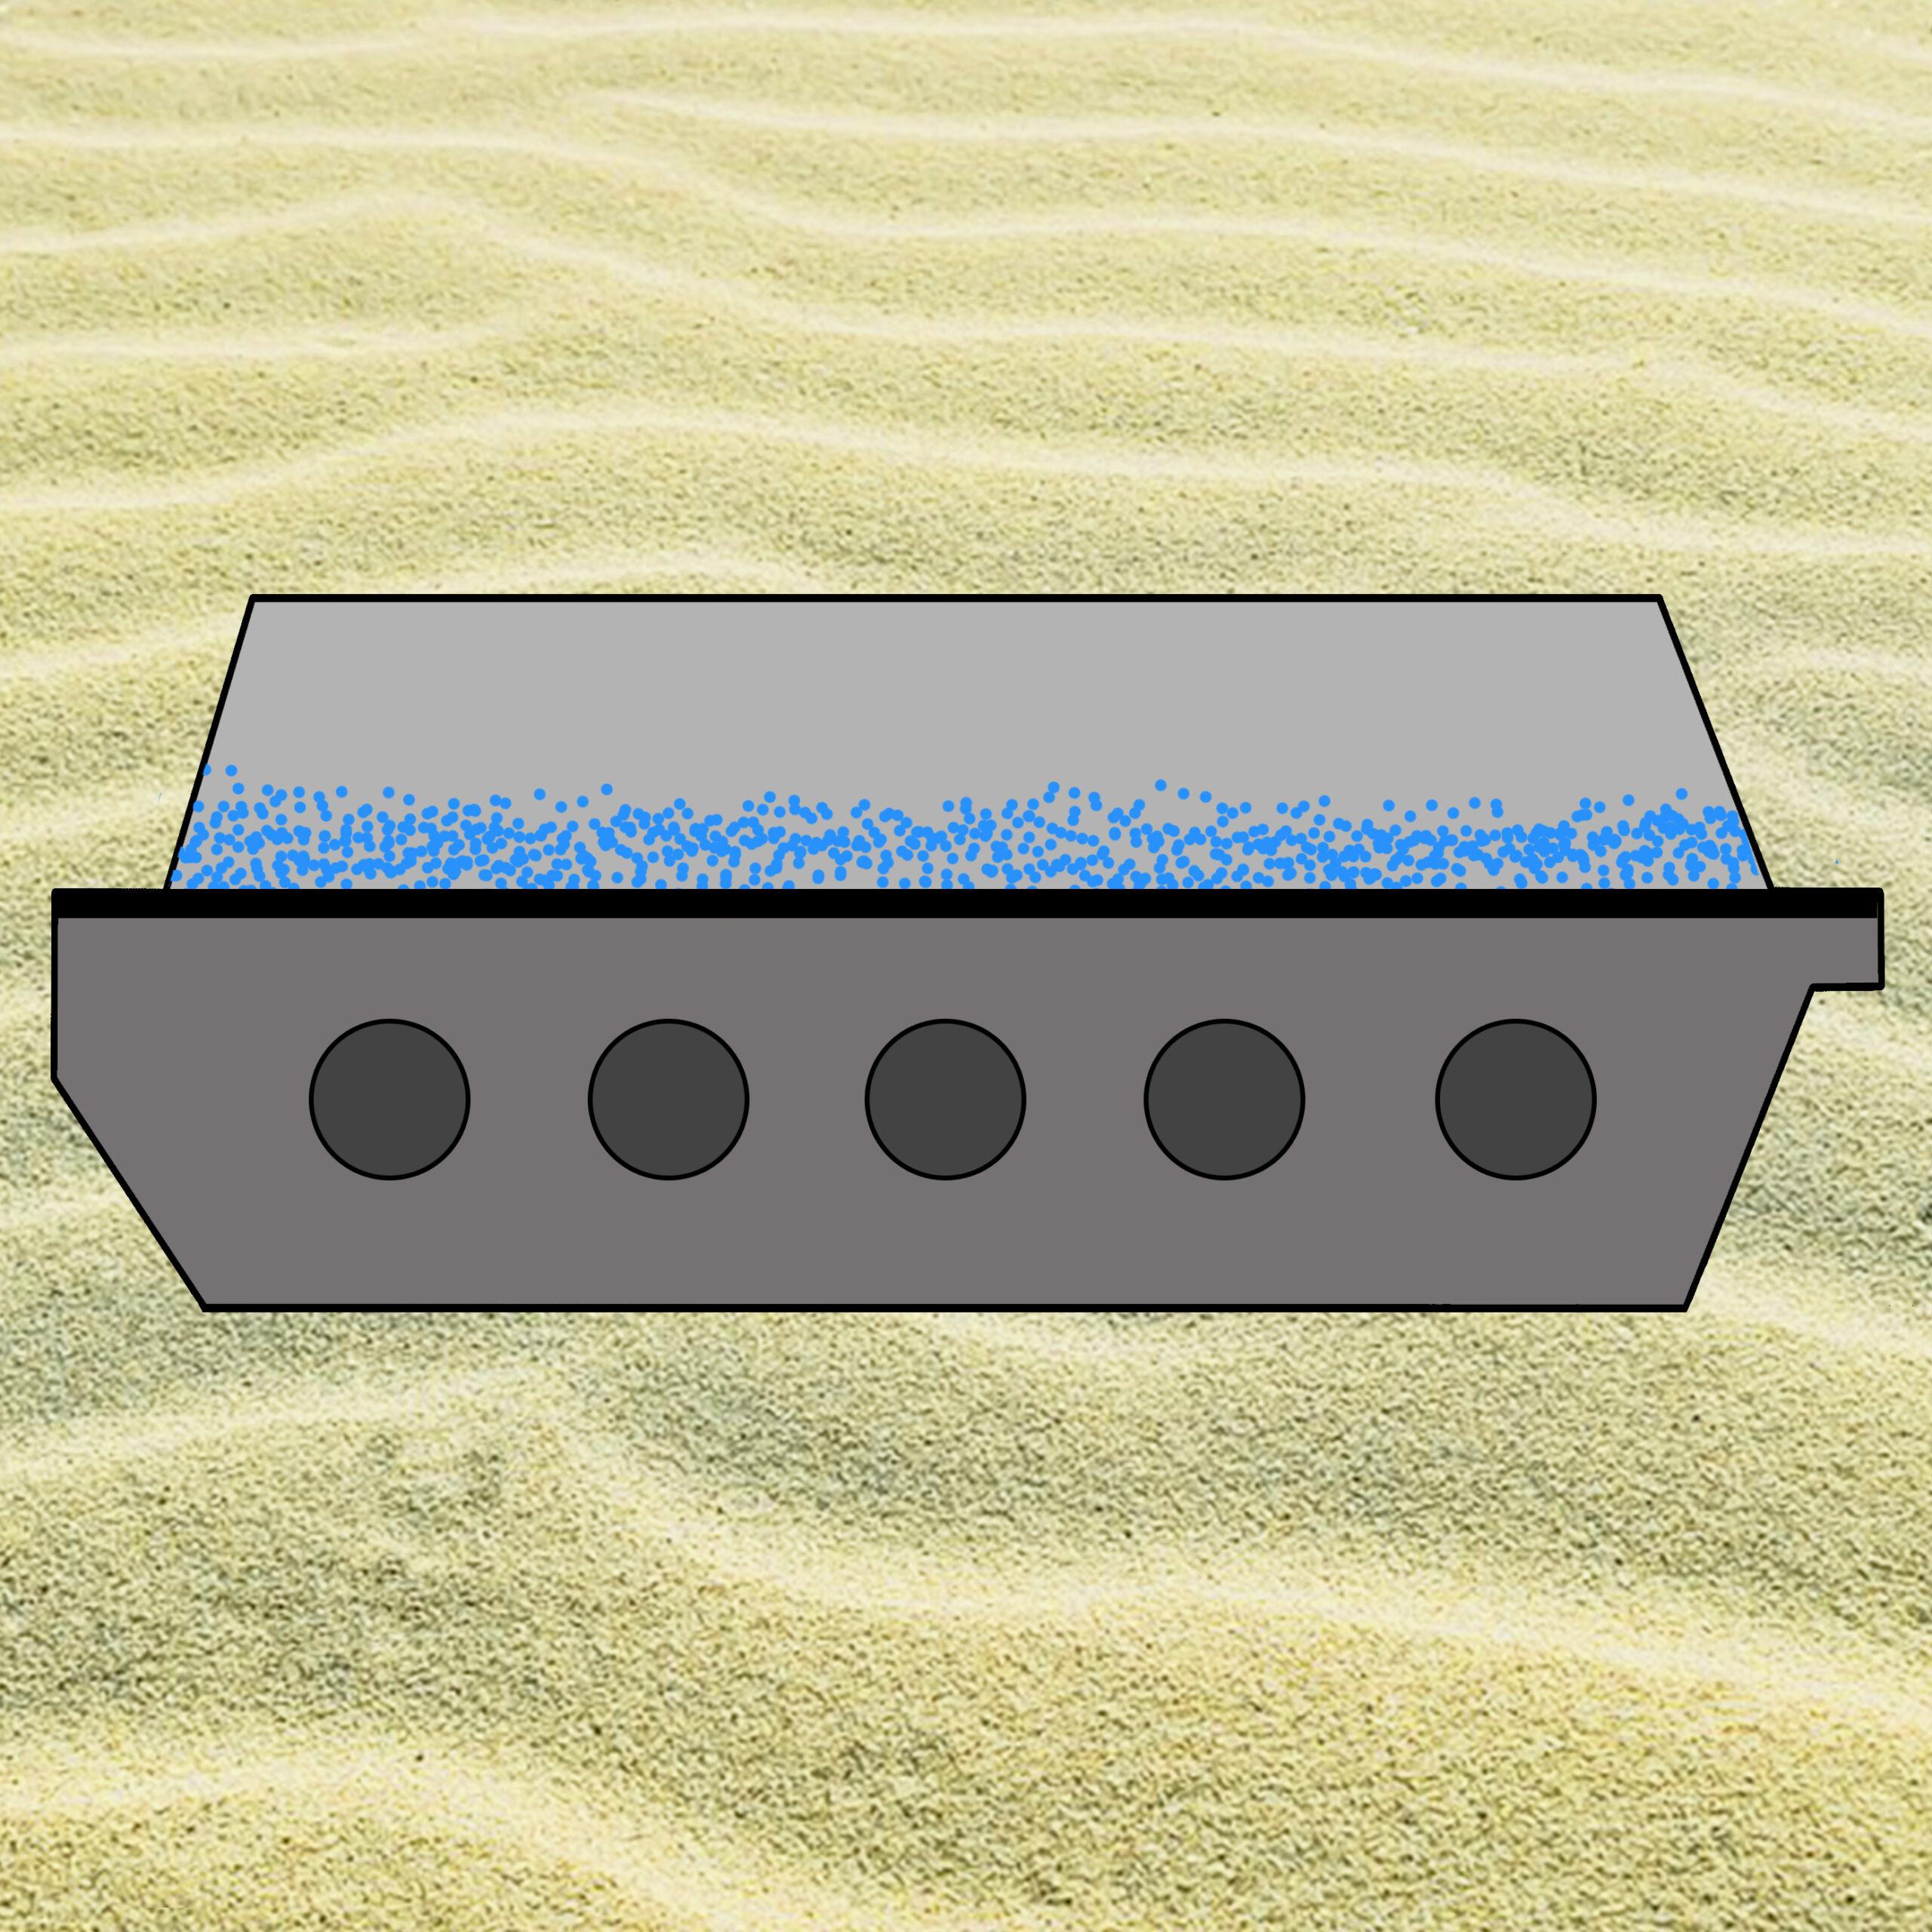 Fluid Bed Fluidization like Quicksand